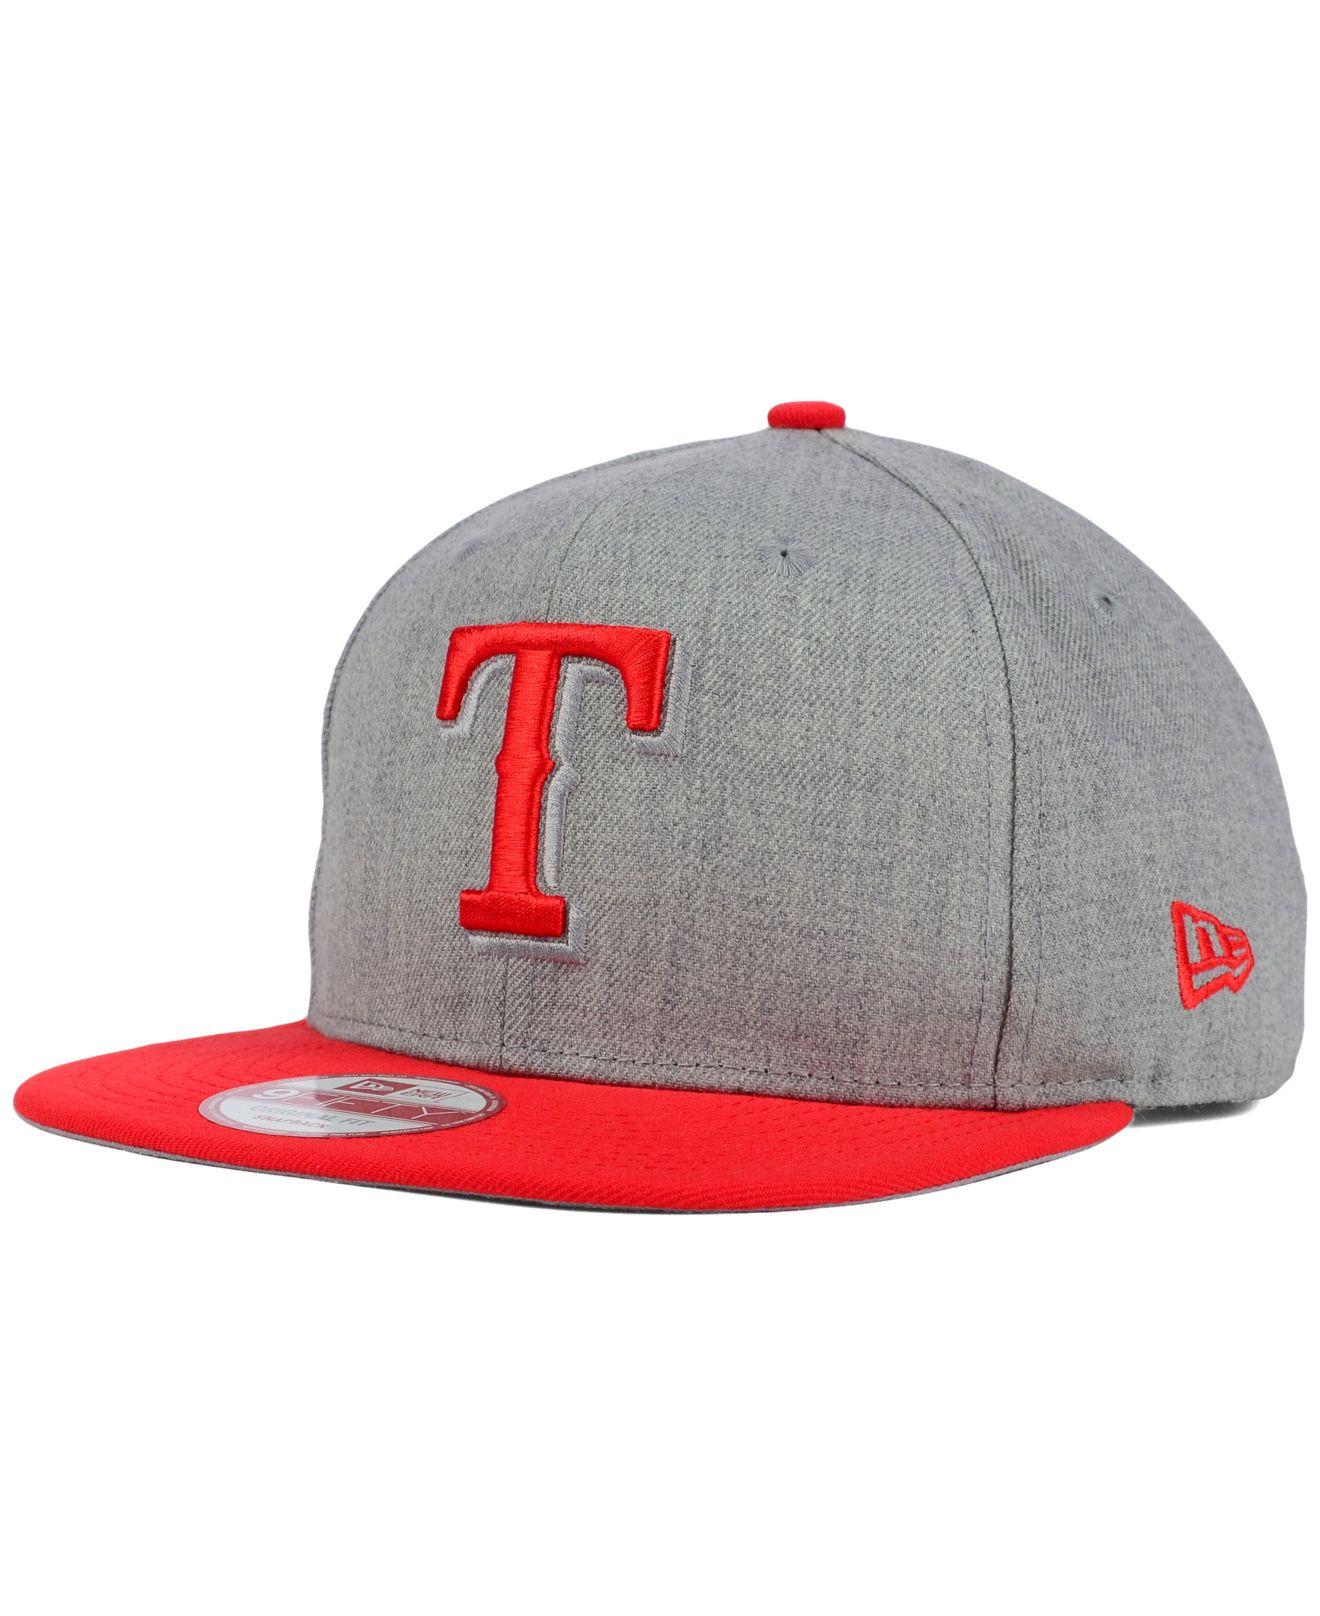 buy online 3210b 5735d Lyst - Ktz Texas Rangers Speed Up 9fifty Snapback Cap in Gray for Men